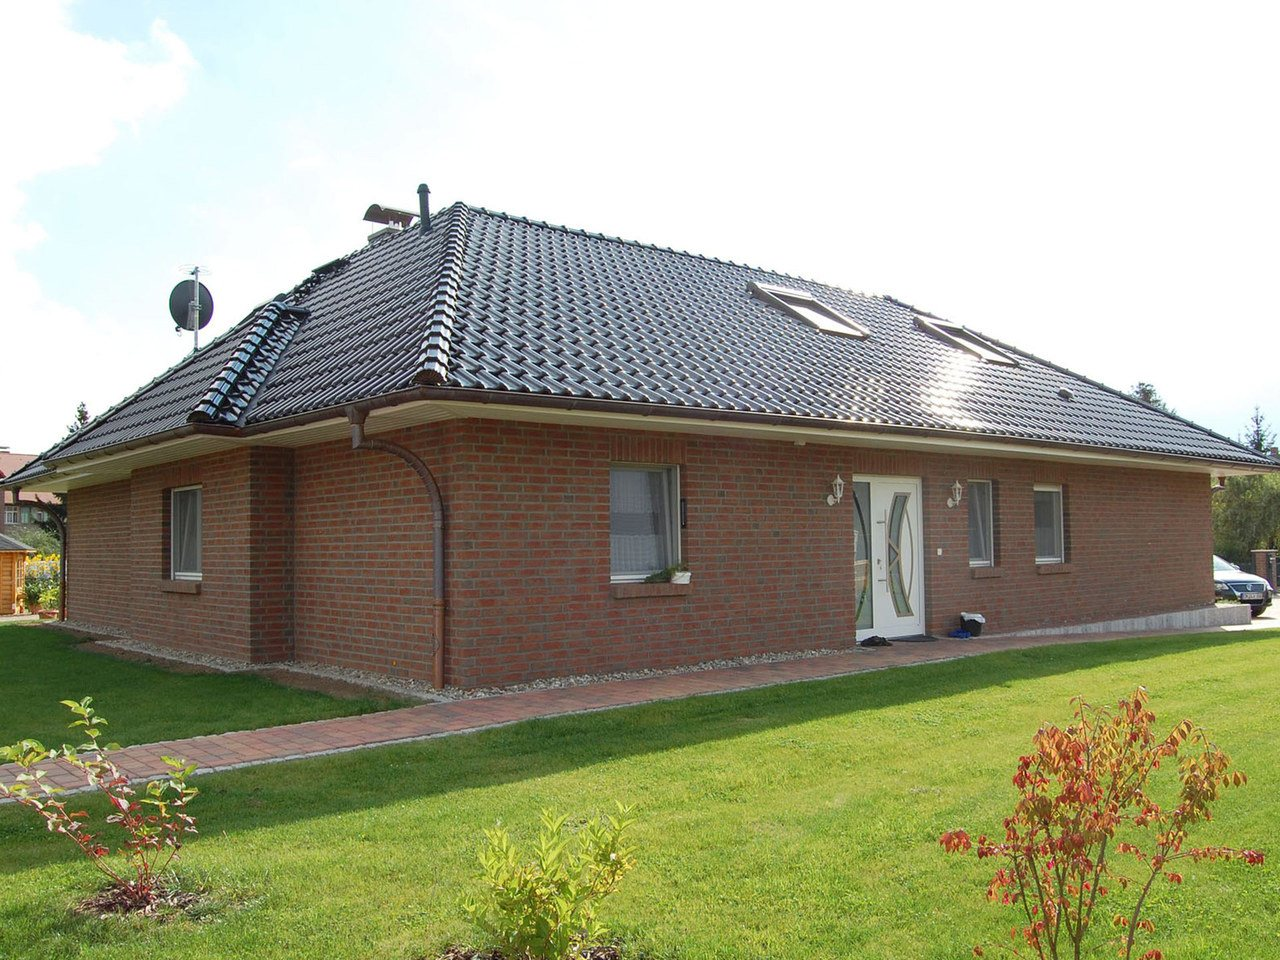 Rothenseer Baugesellschaft - Haus Am Deich Ansicht 2